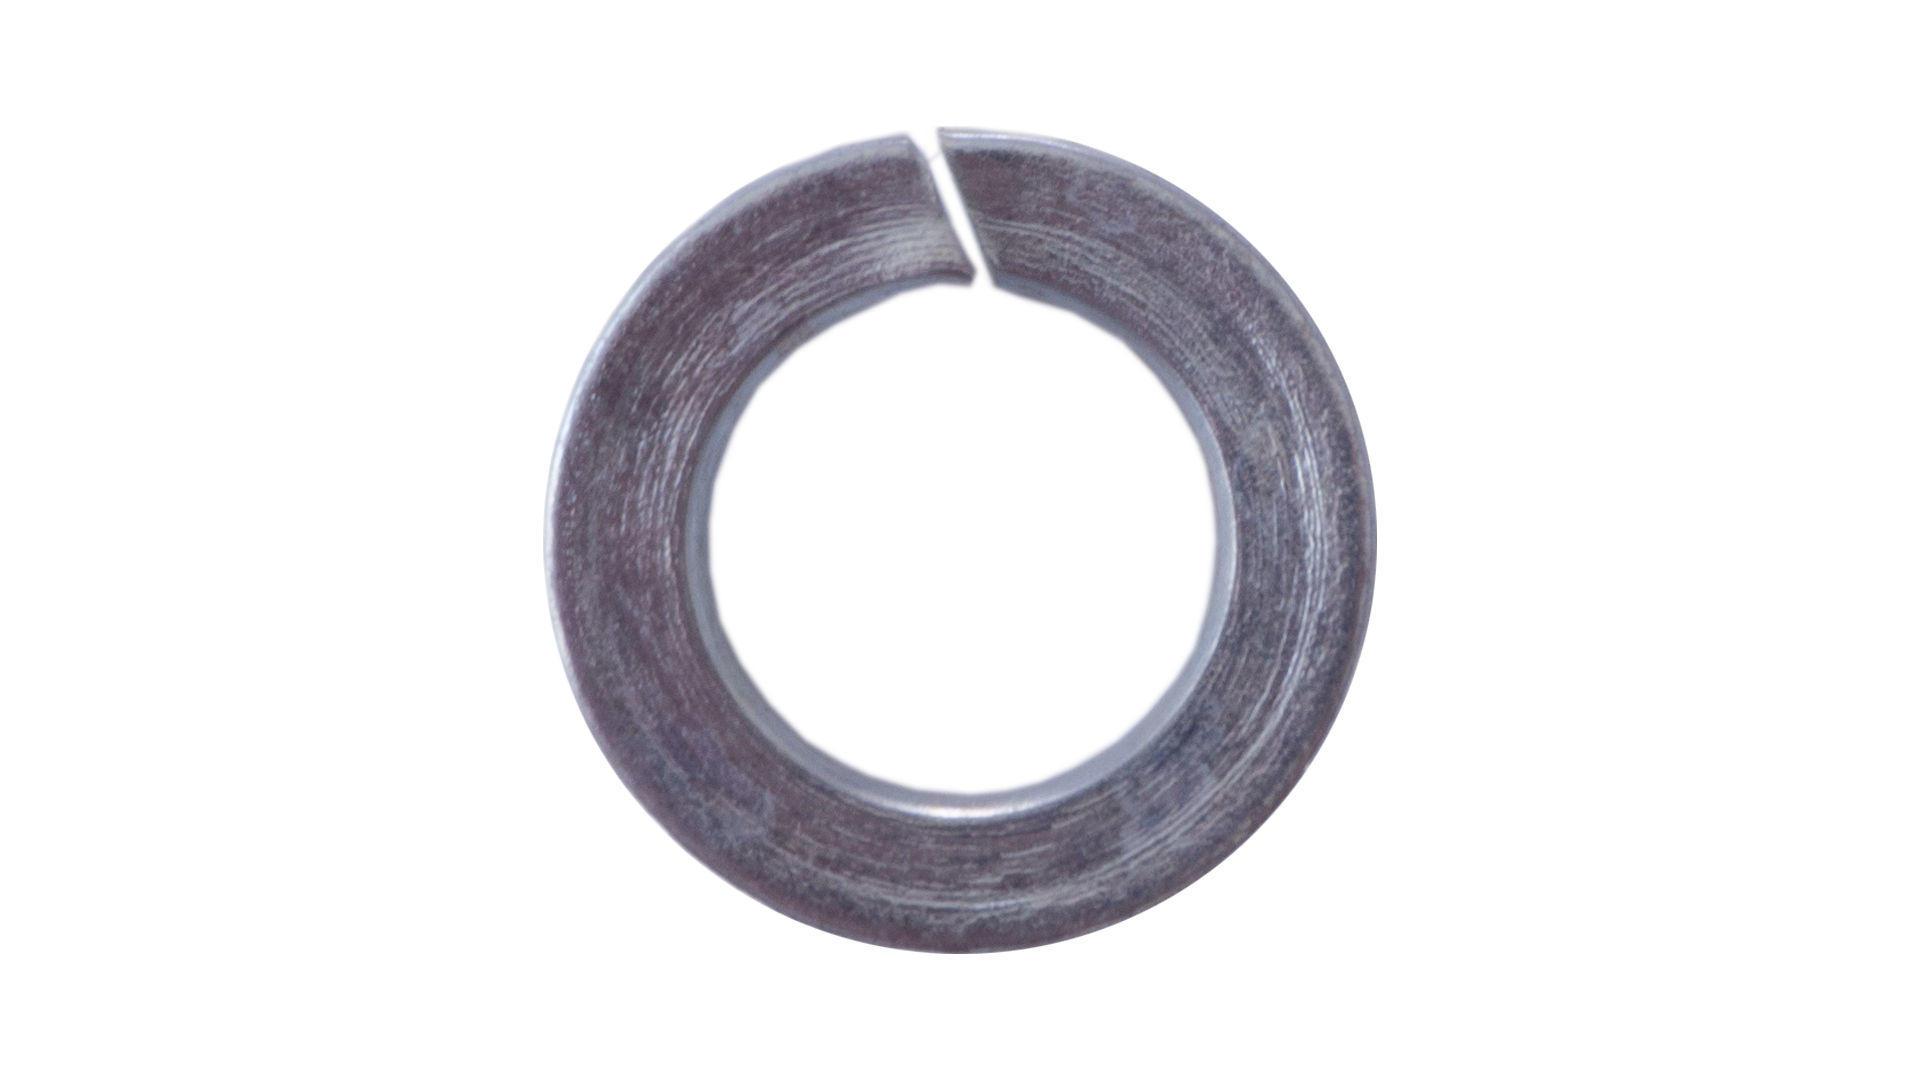 Шайба пружинная Apro - М10 DIN 127 (100 шт.) 4